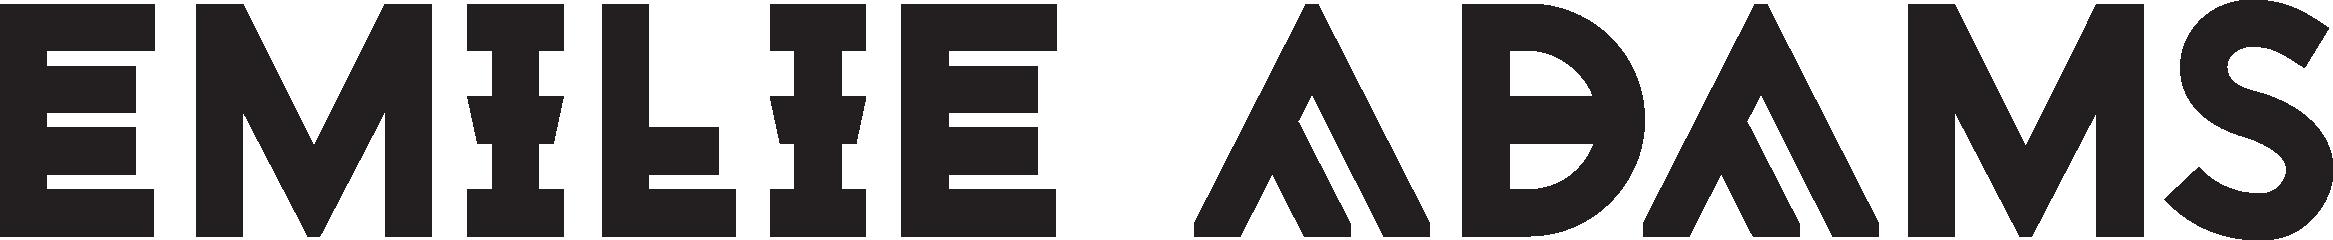 Emilie_Adams_logo.png